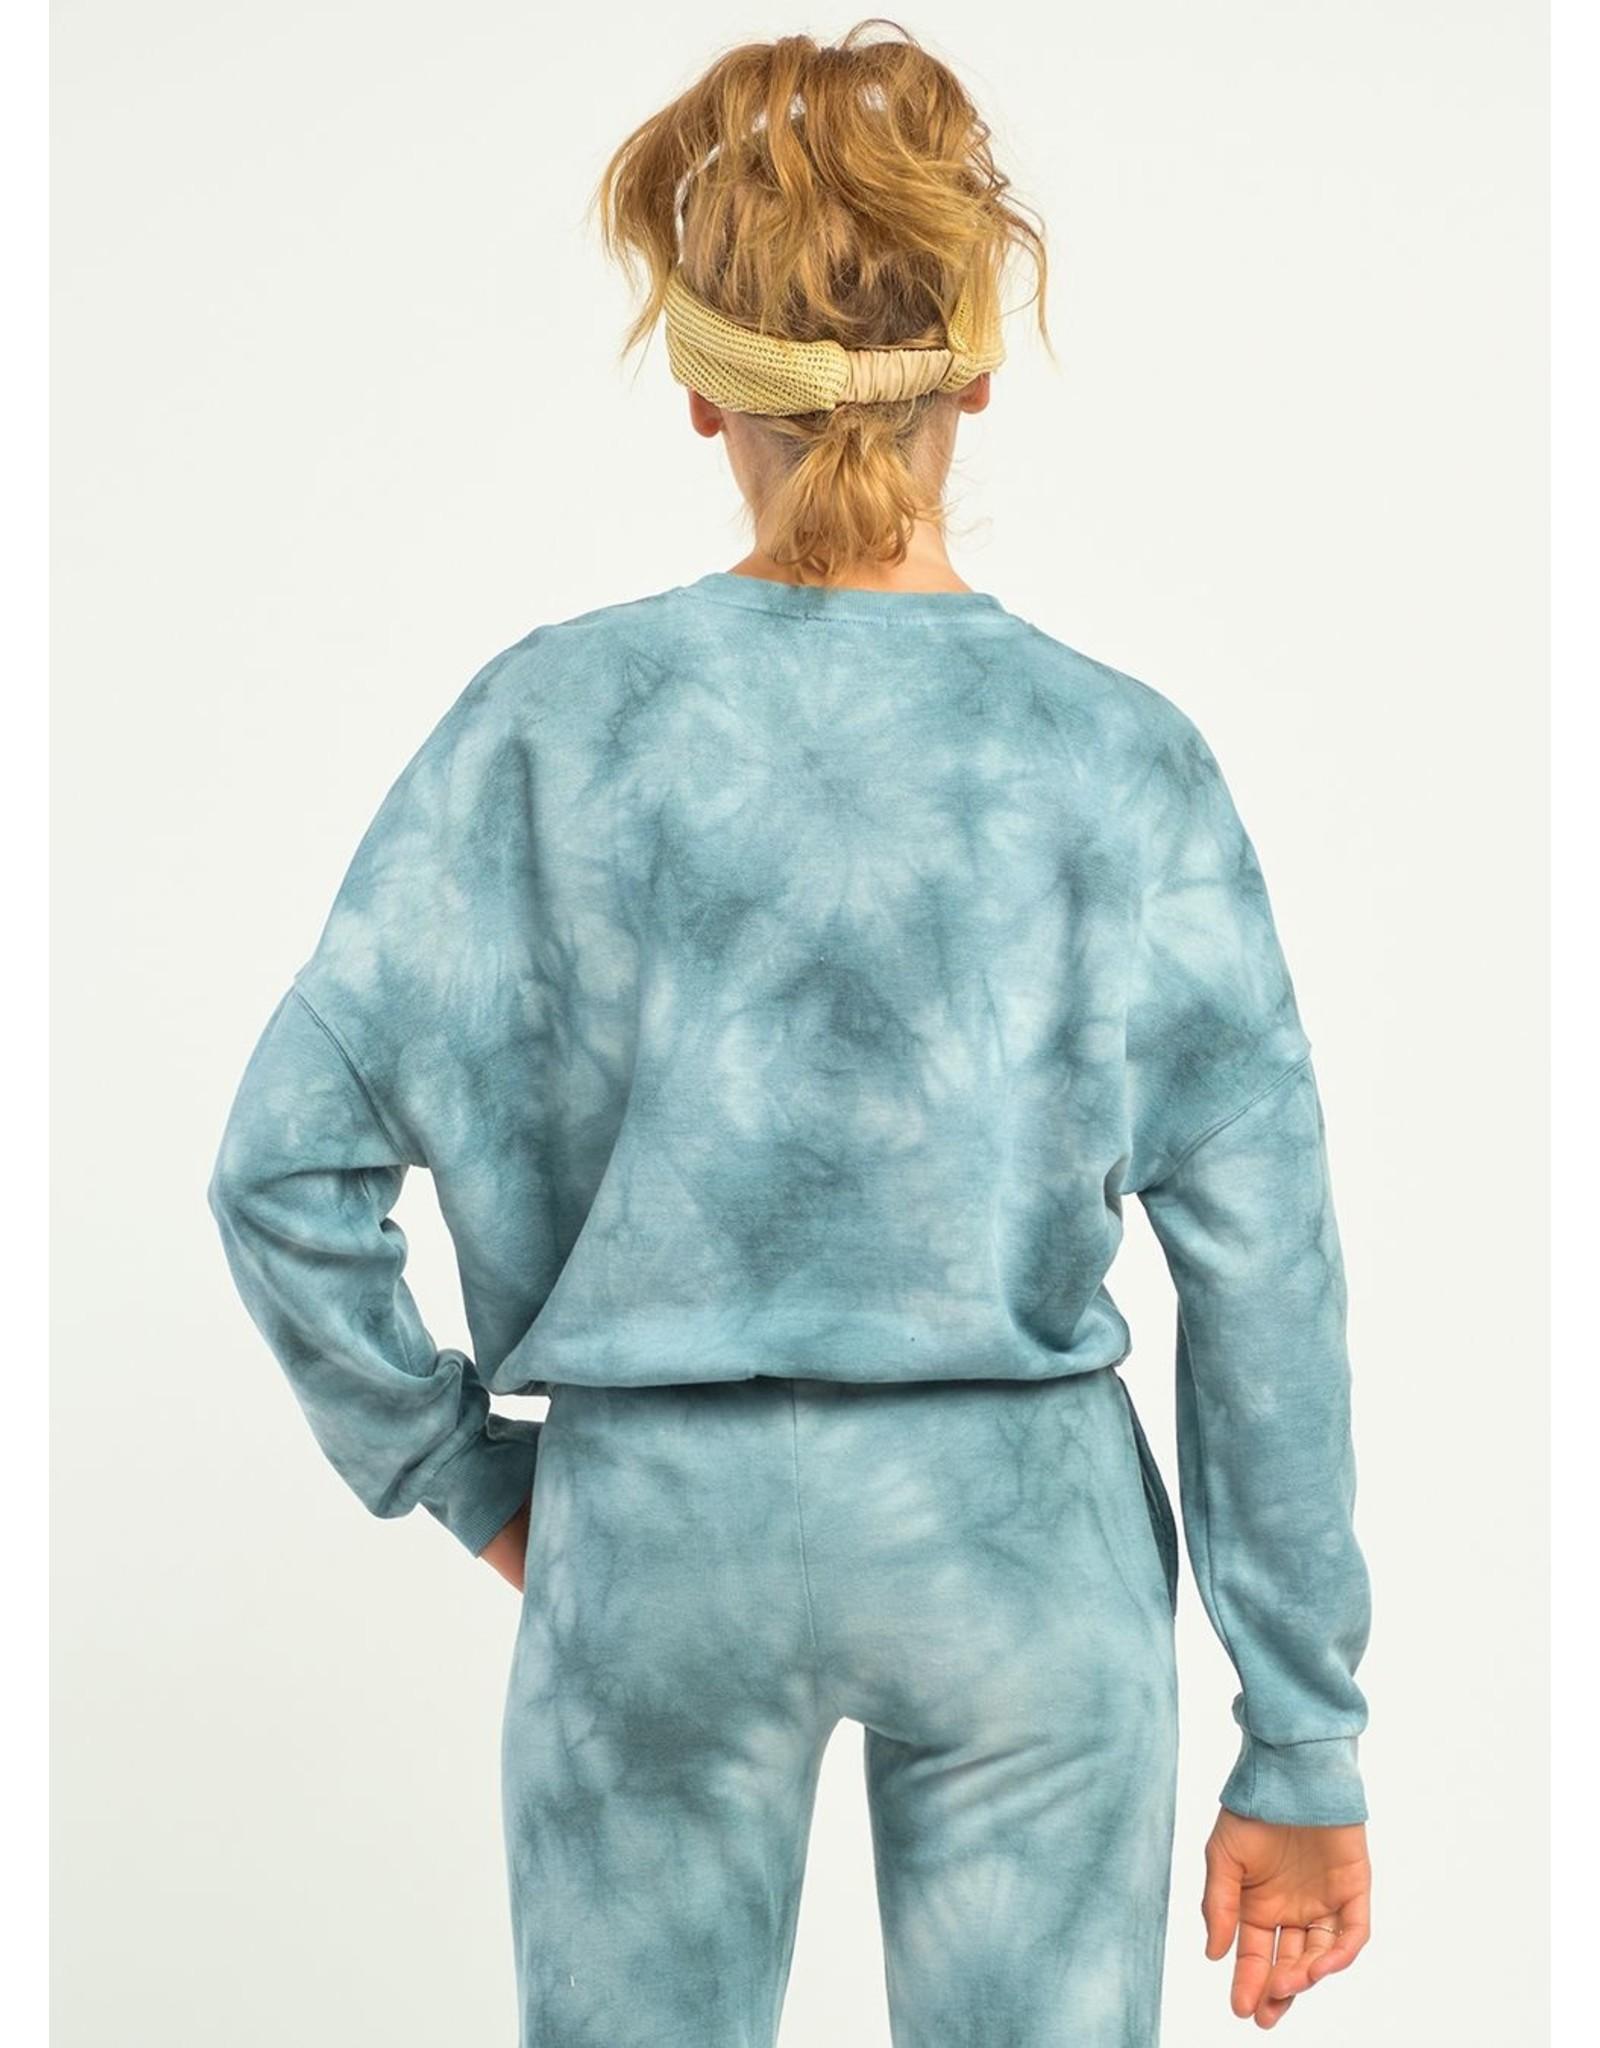 Dex - Tie Dye Sweatshirt